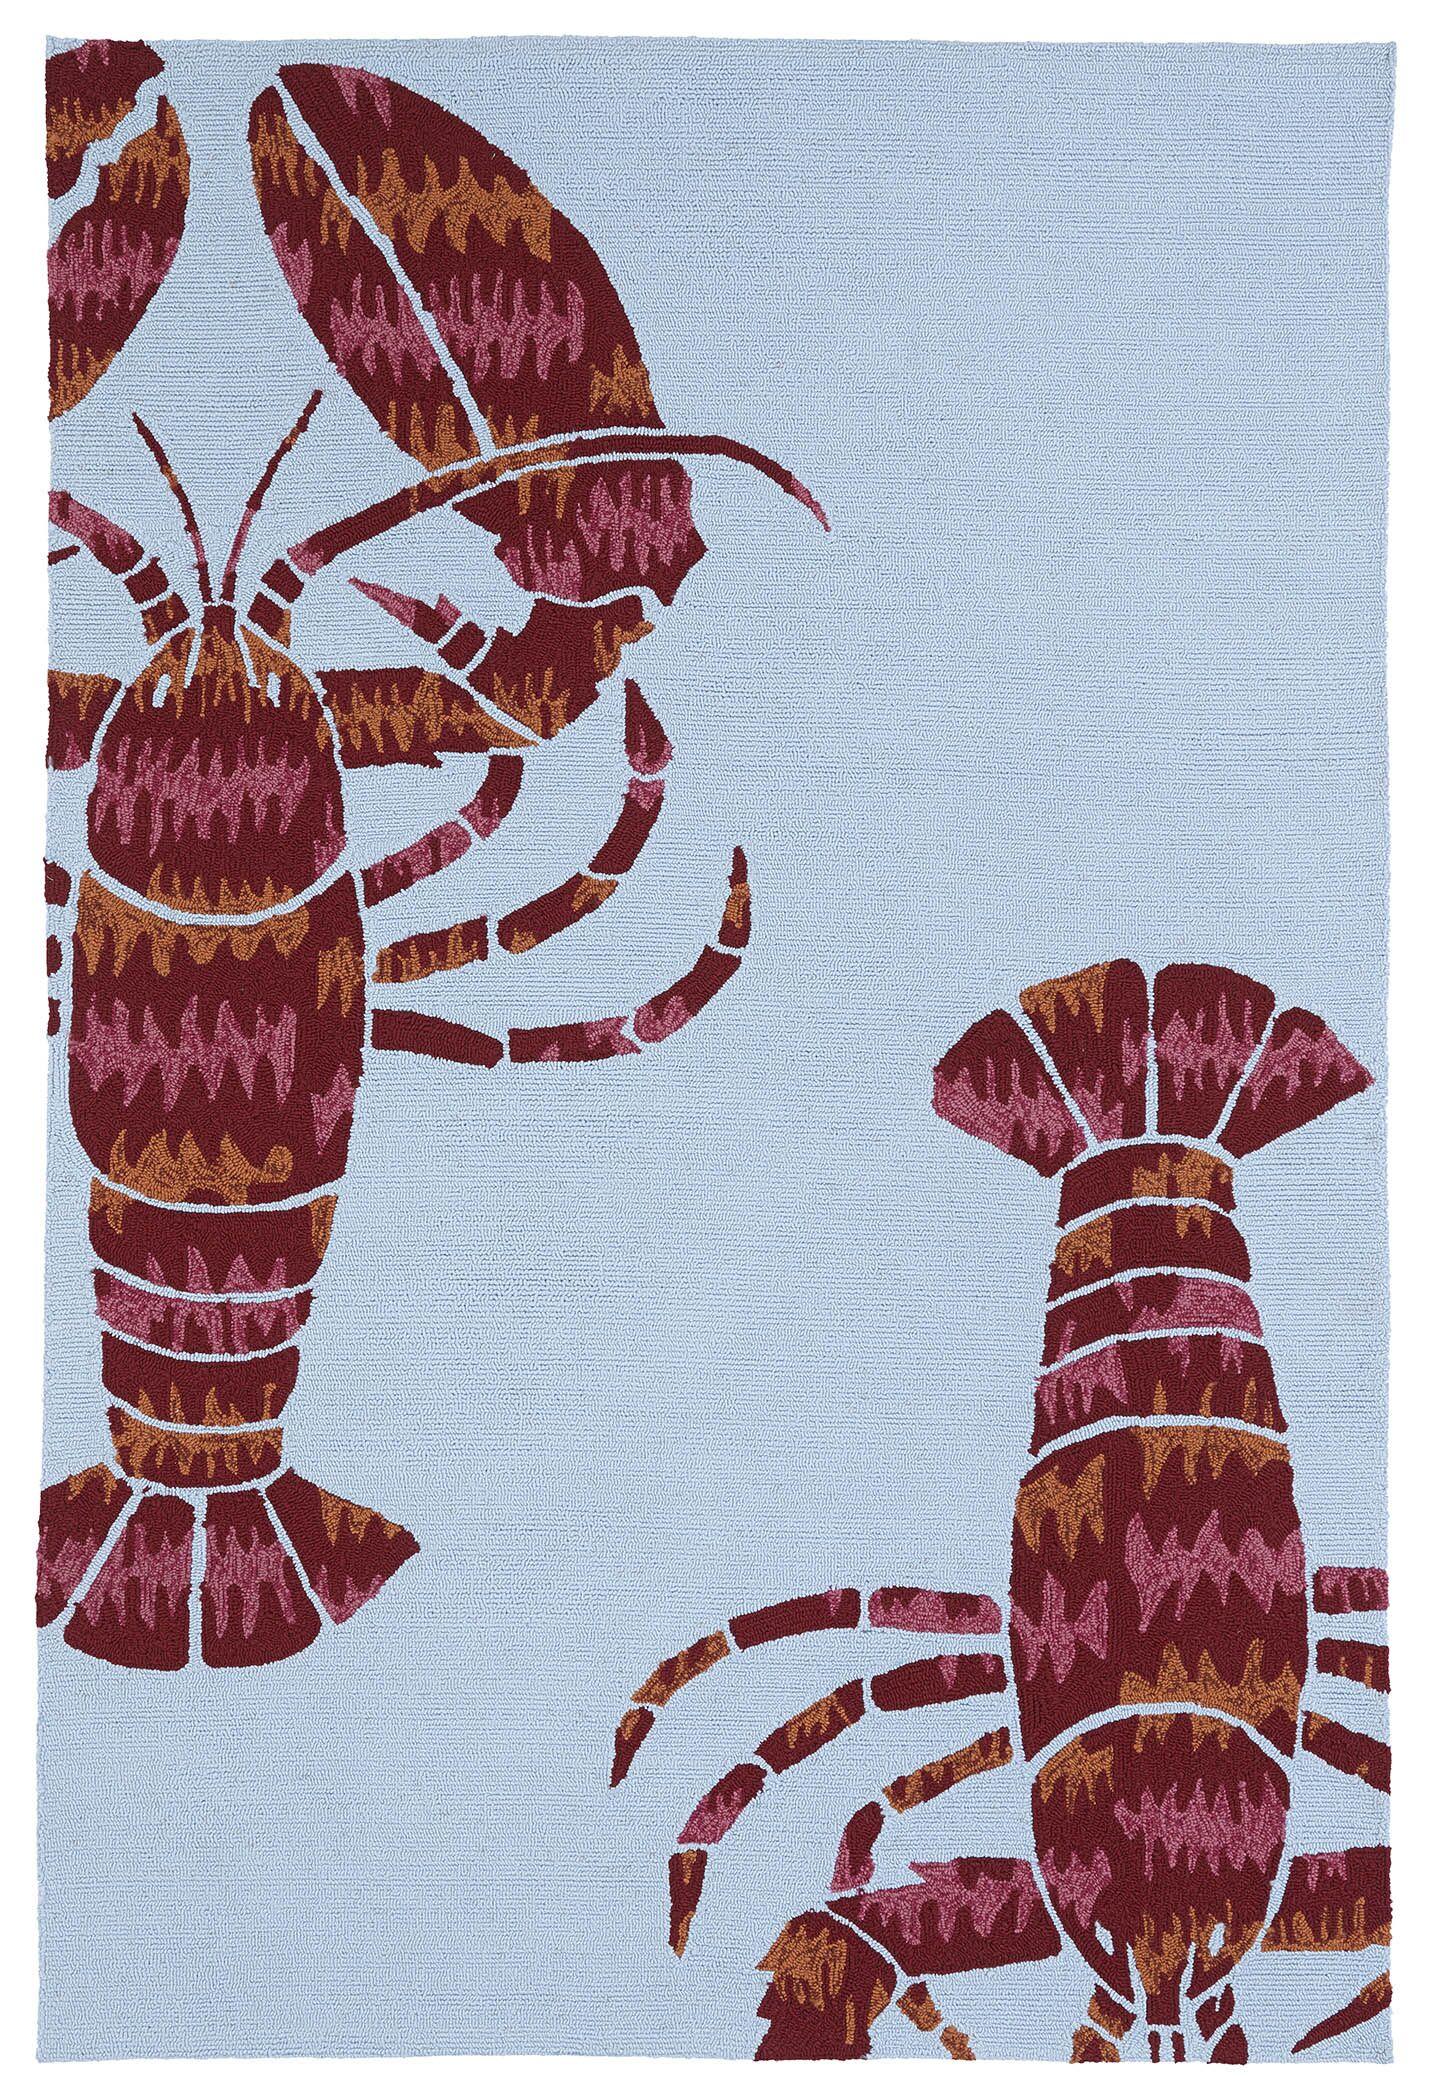 Gordon Hand Tufted Indoor/Outdoor Area Rug Rug Size: Rectangle 8'6